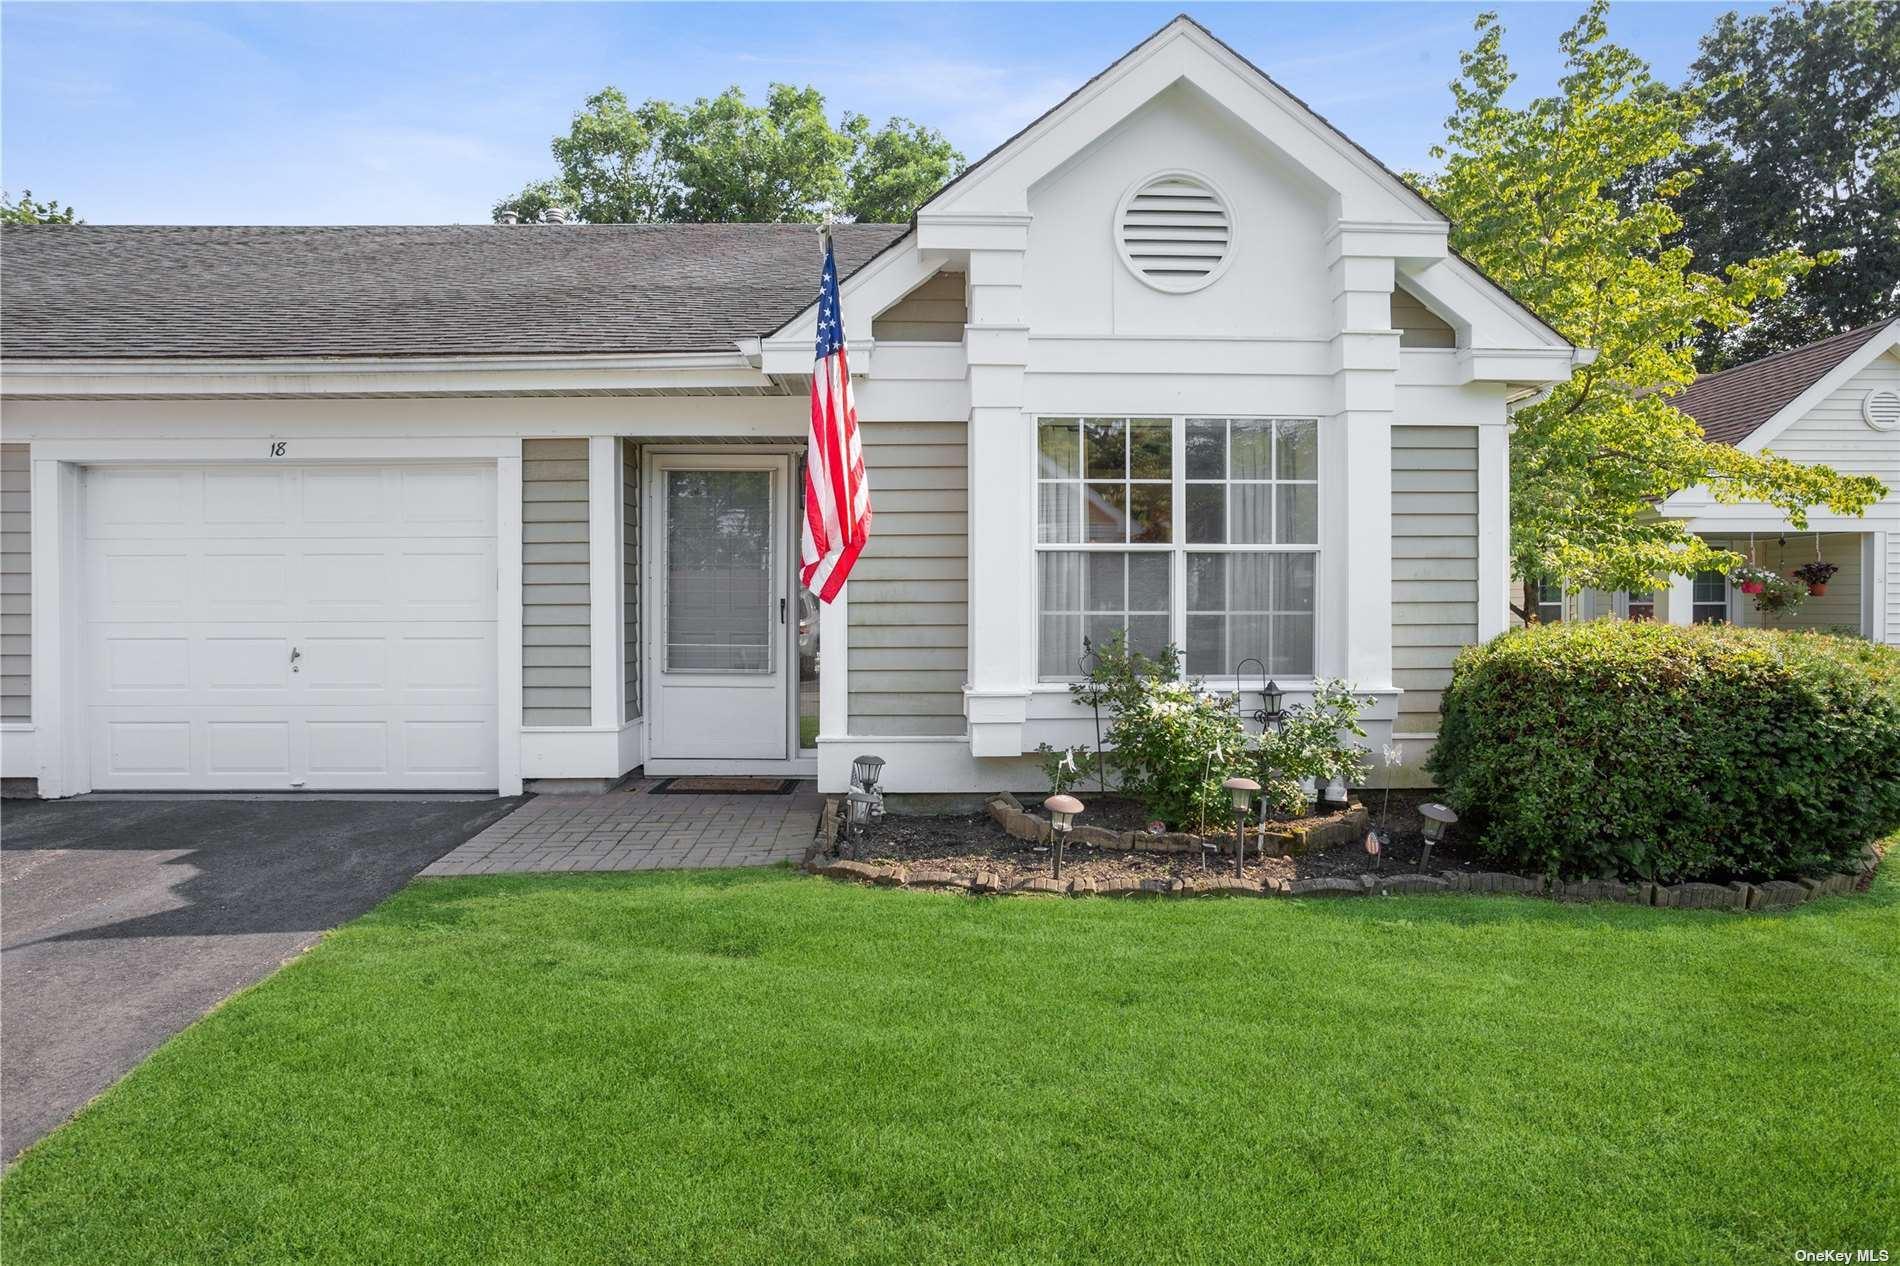 18 Douglaston #18, Ridge, NY 11961 - MLS#: 3345396